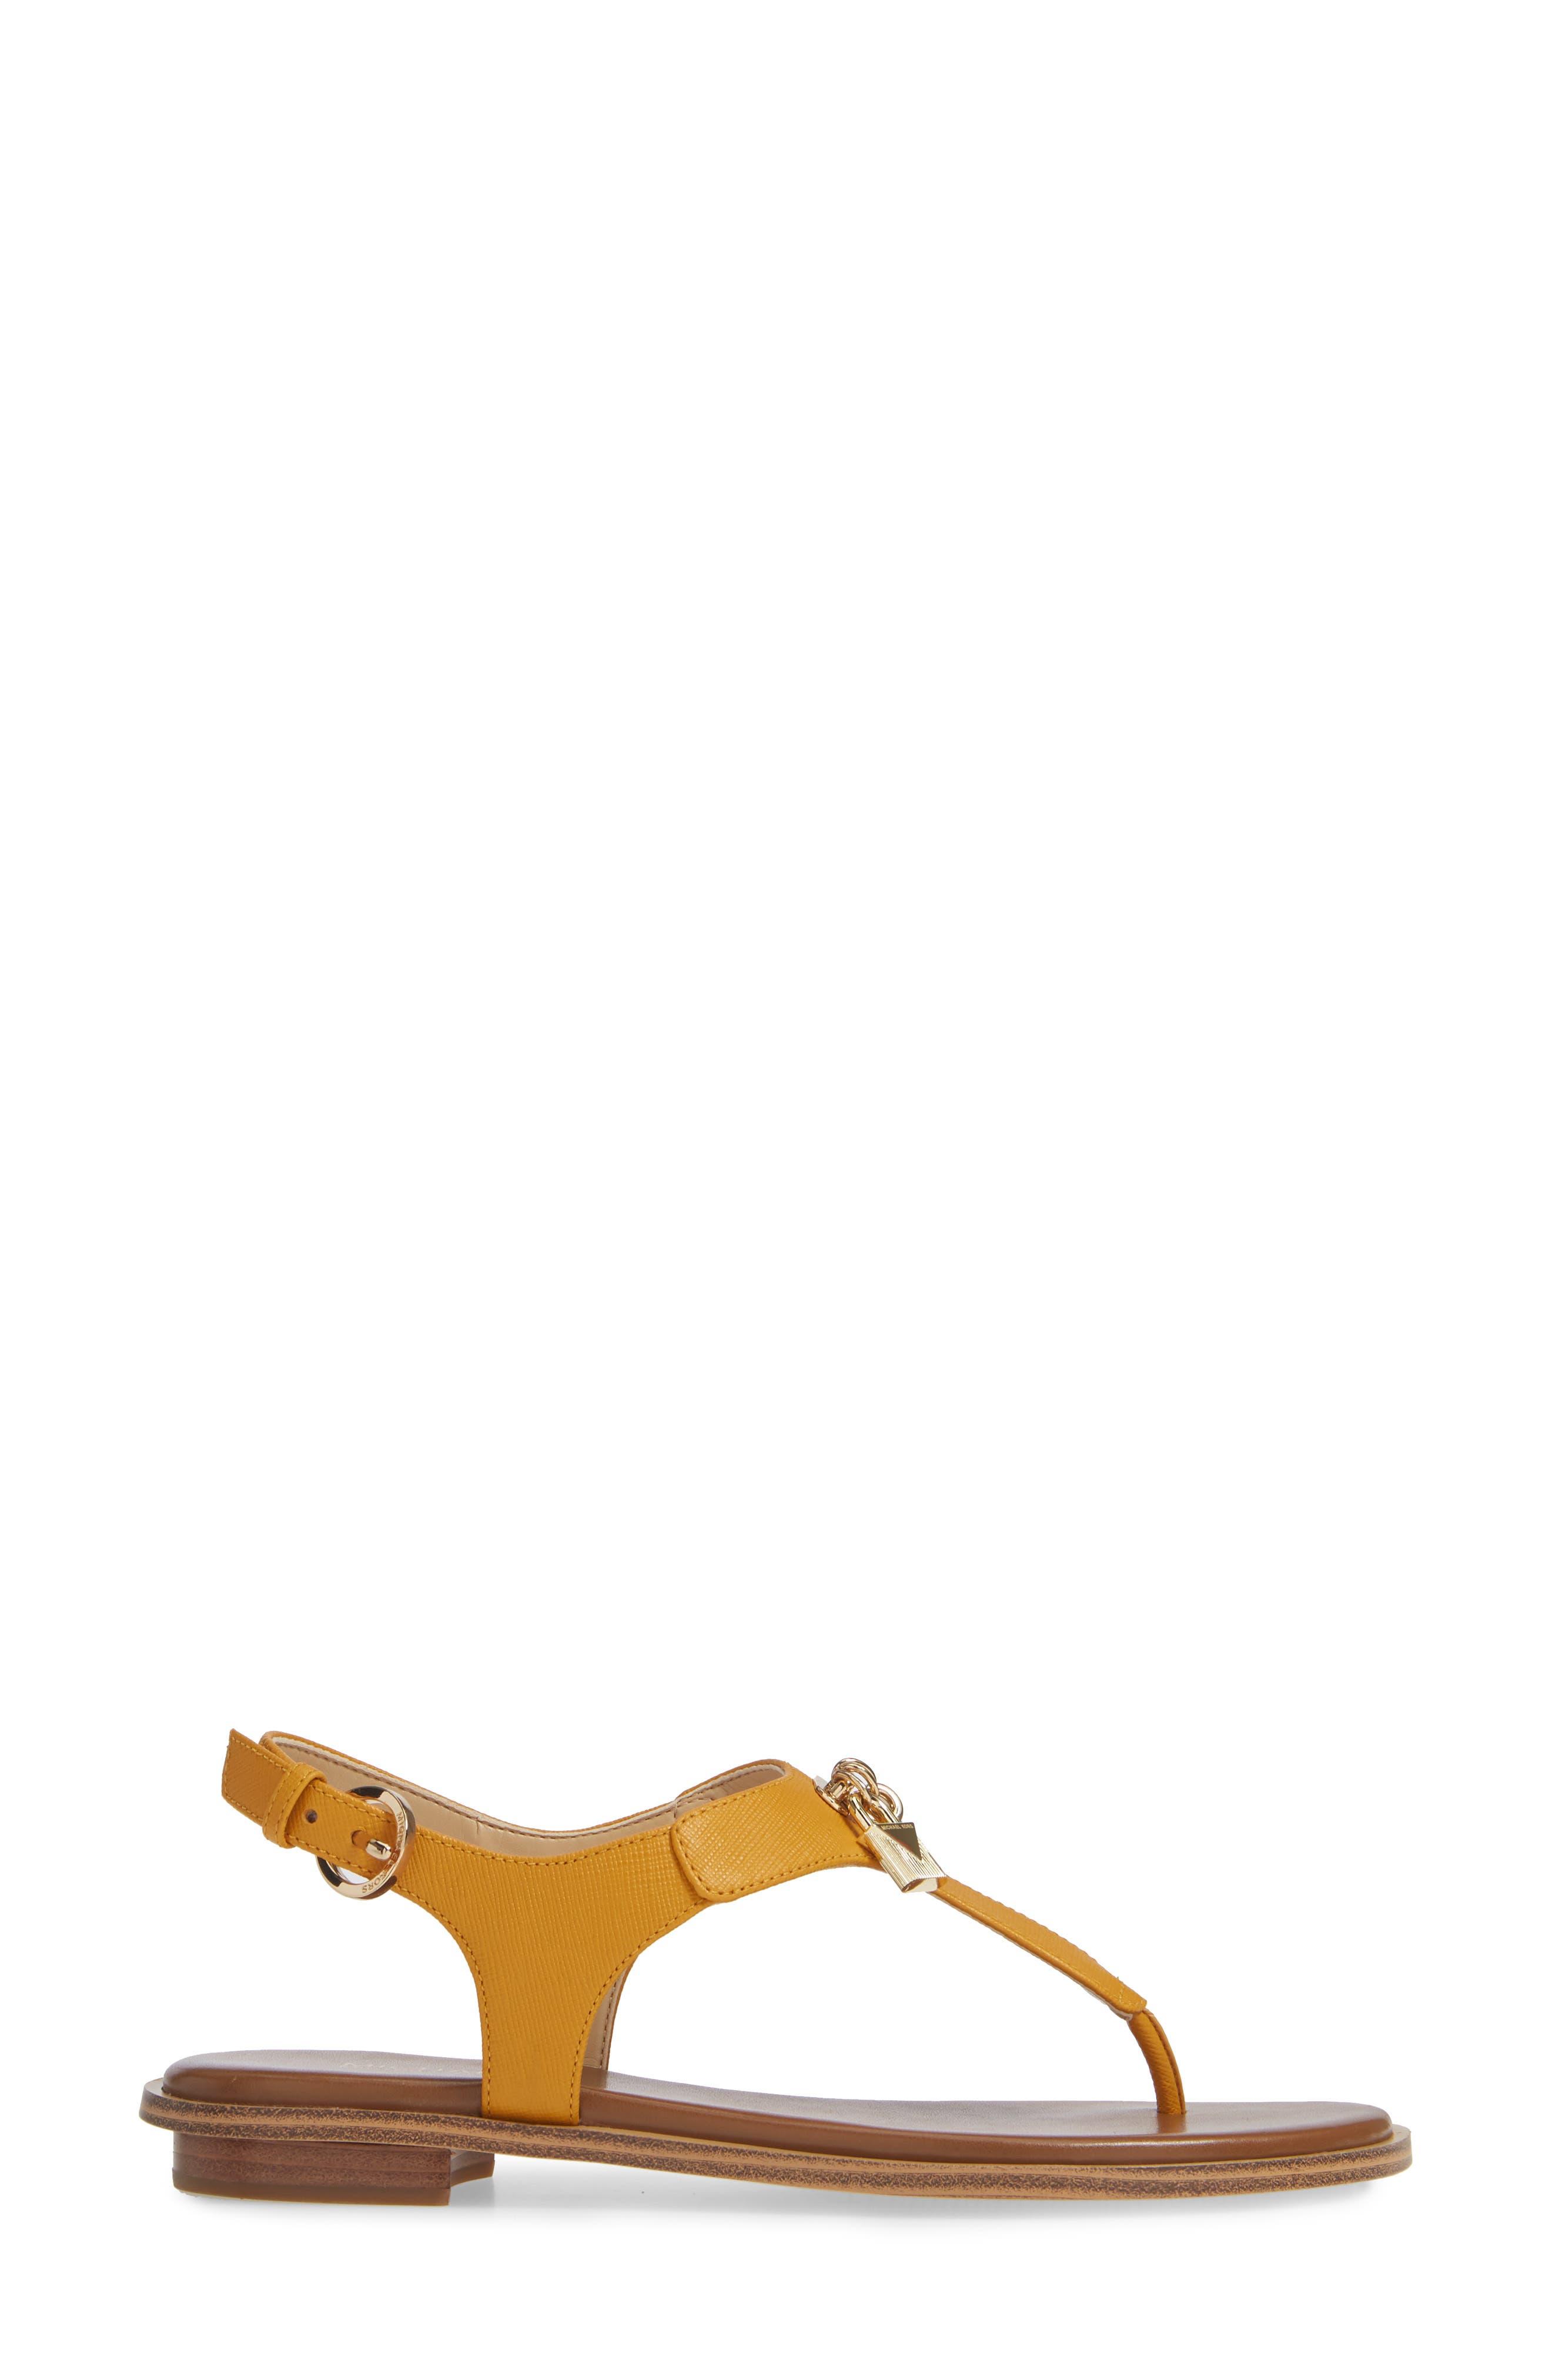 Suki T-Strap Charm Sandal,                             Alternate thumbnail 3, color,                             MARIGOLD LEATHER